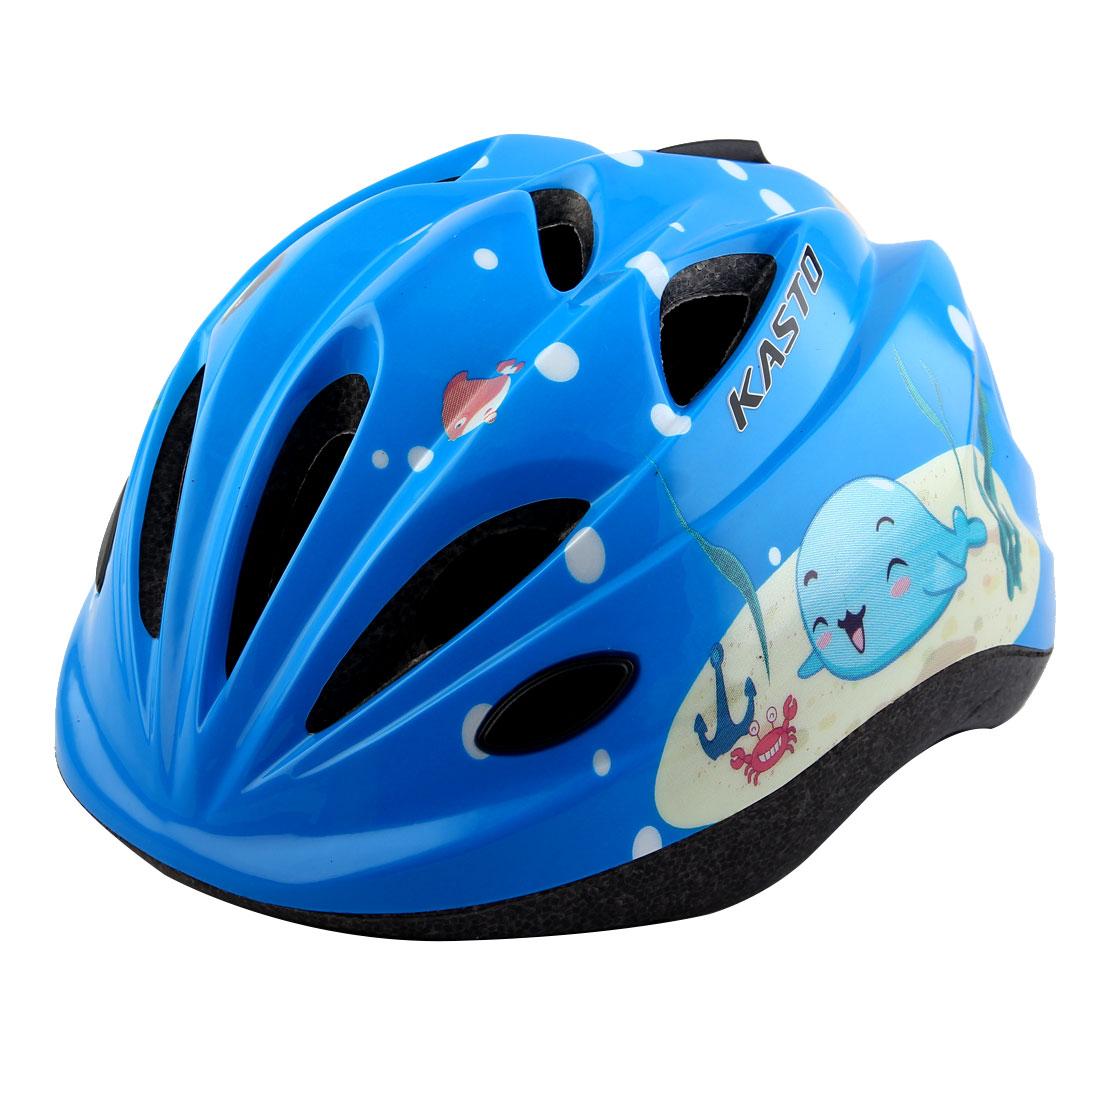 Boys Girls LED Light Adjustable Belt Removable Liner Road Cycling Mountain Bicycle Cap Safety Bike Helmet Blue